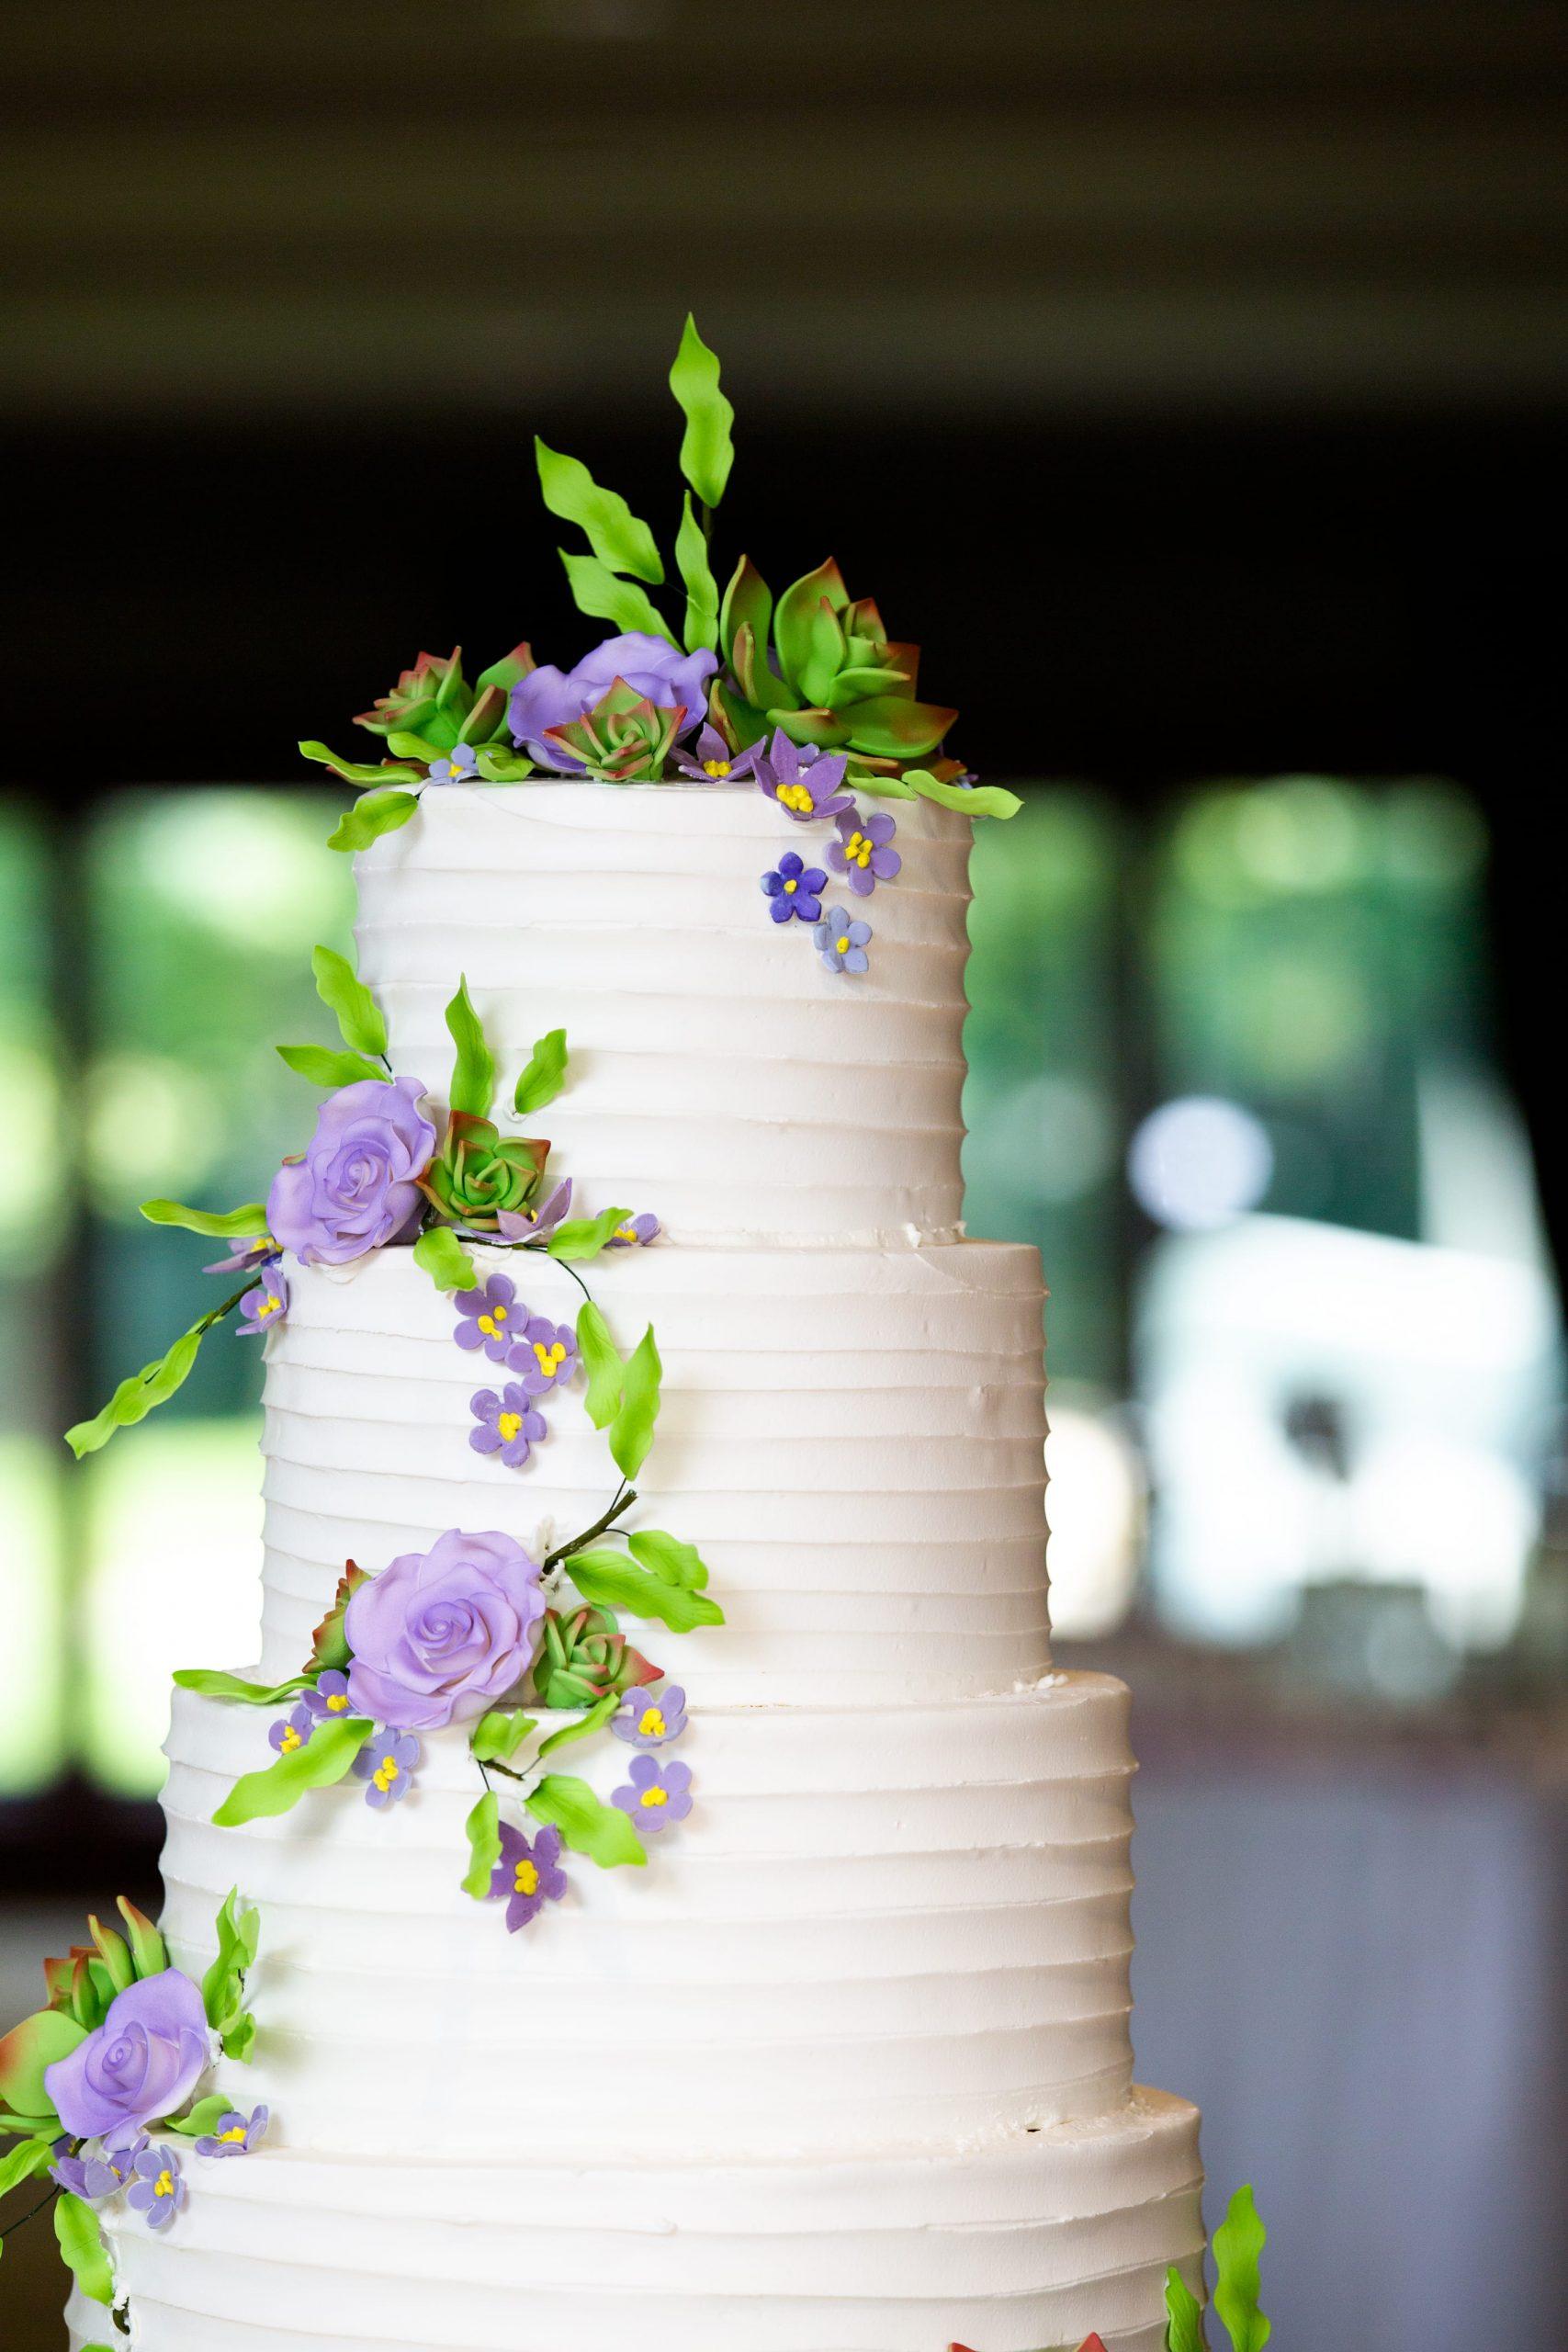 white and purple tiered wedding cake